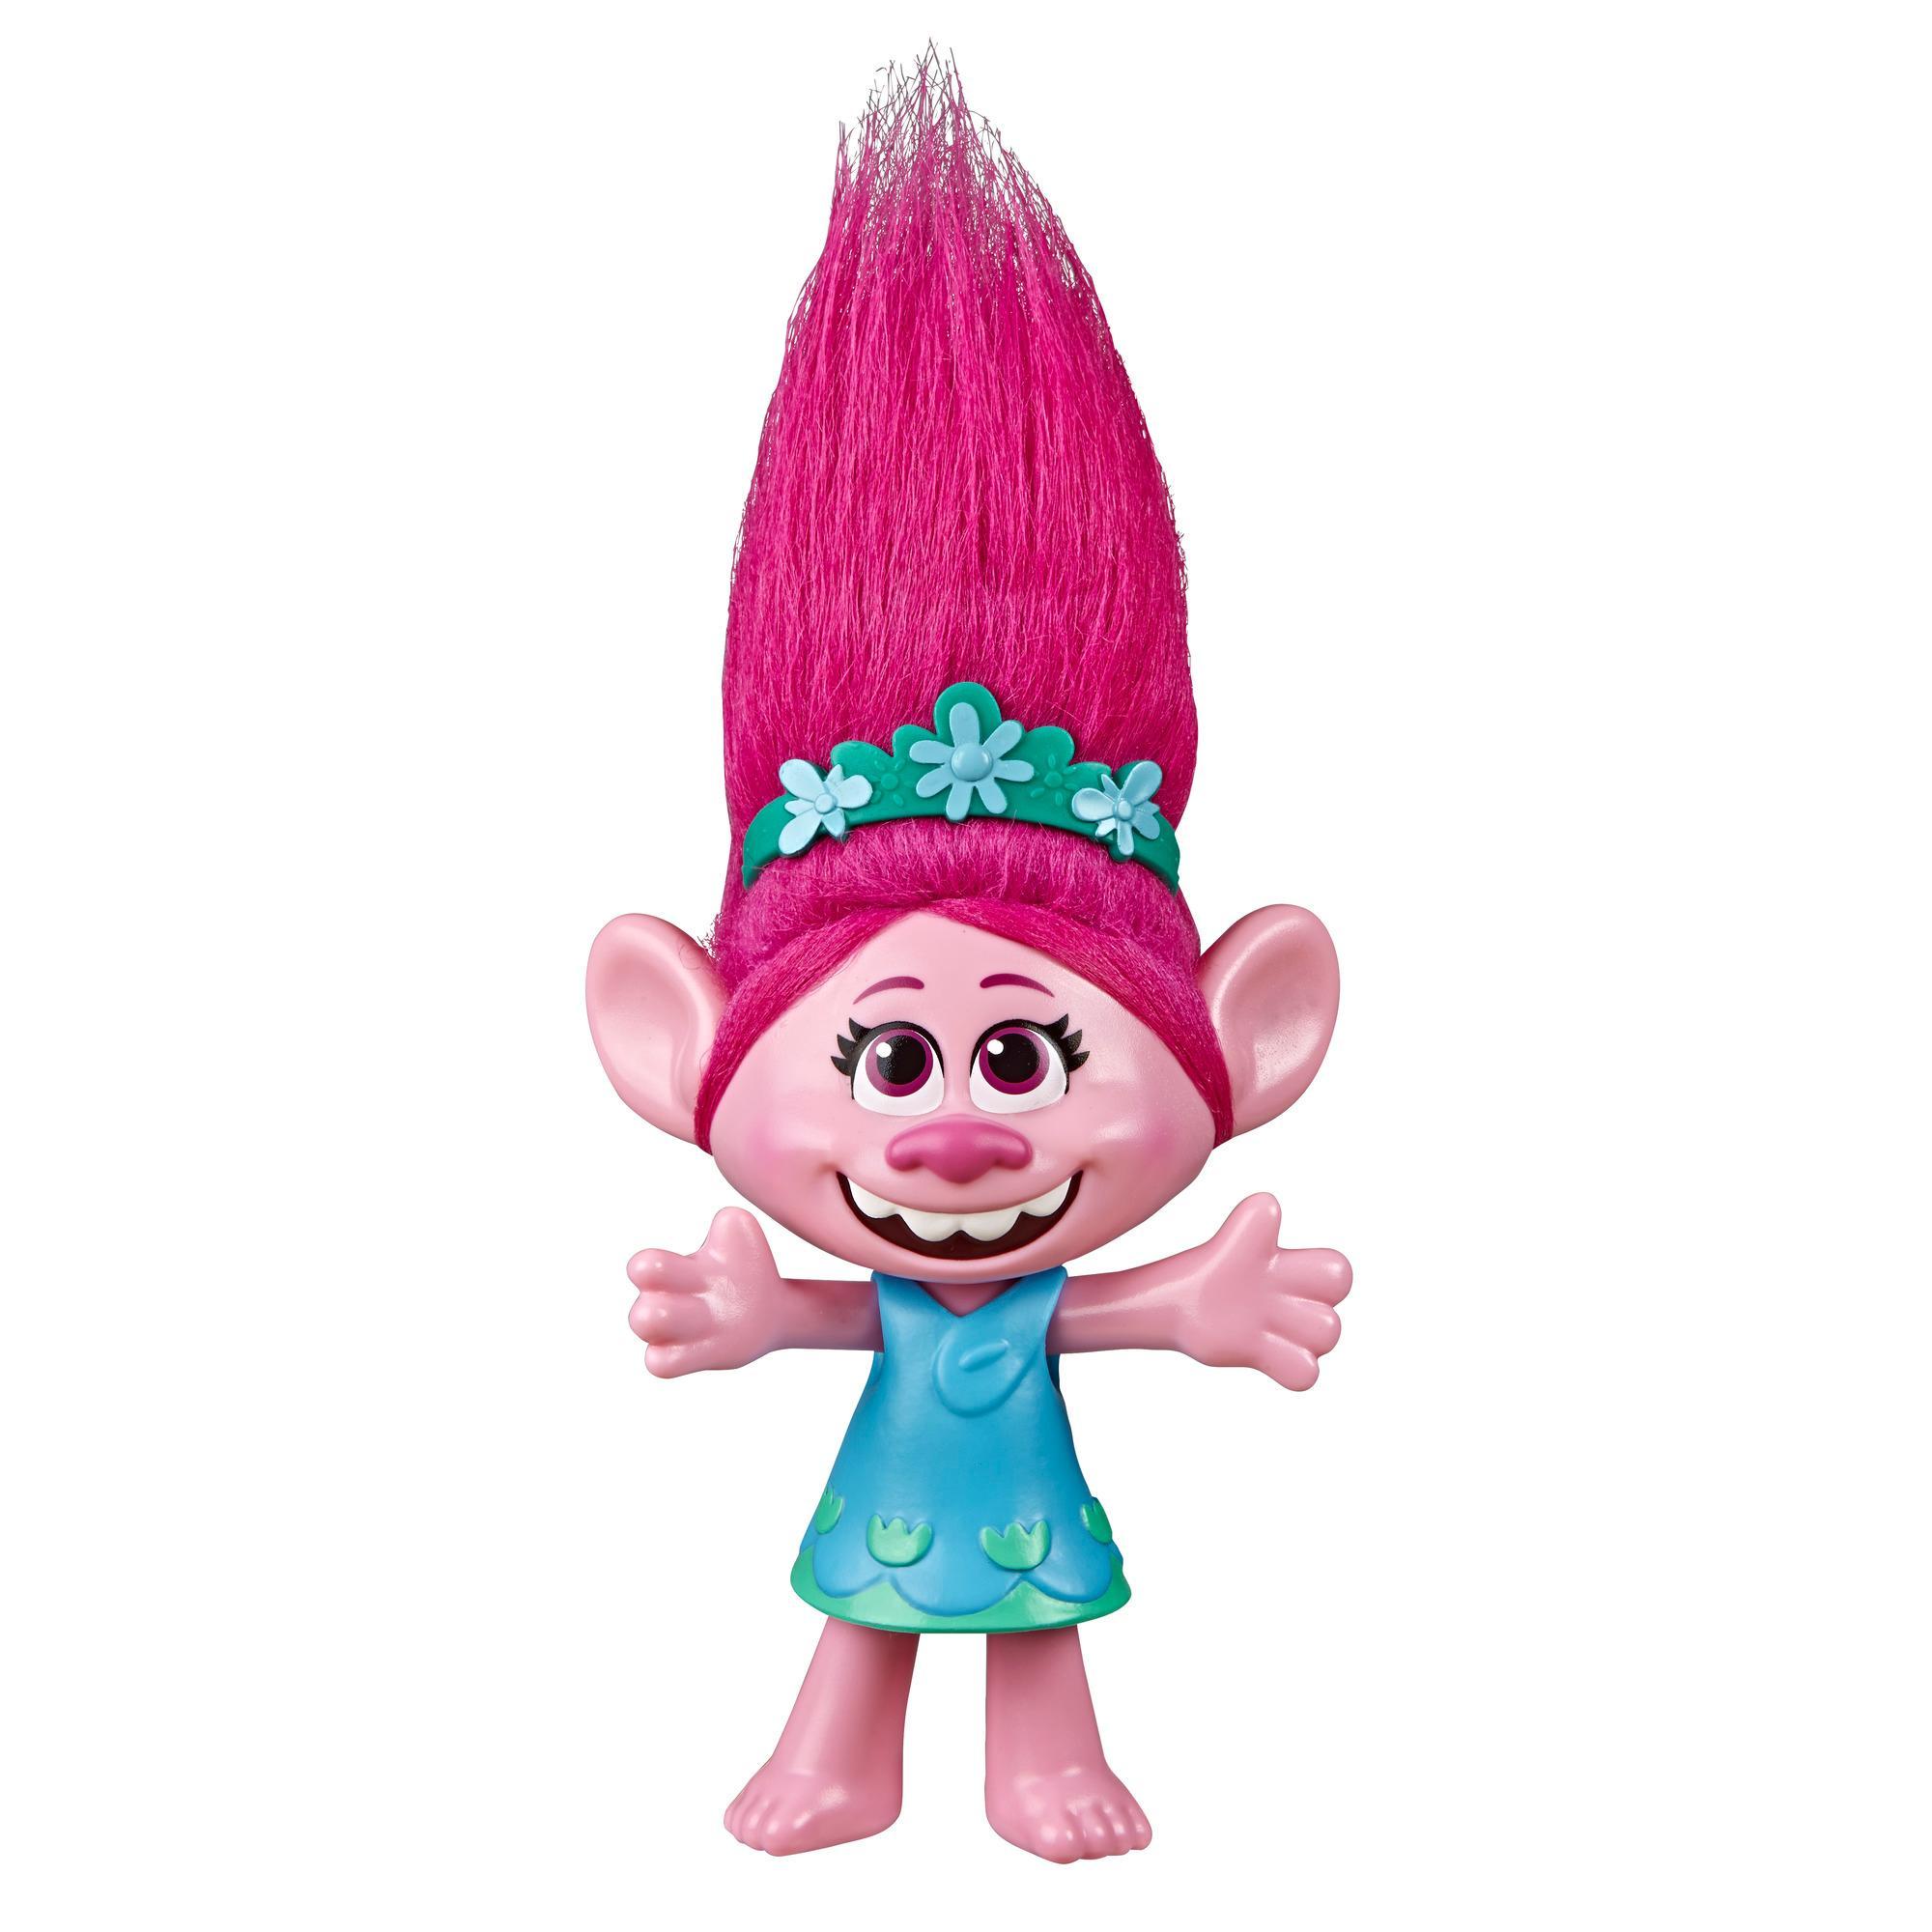 "Trolls da DreamWorks Poppy Cantora pop - Boneca, Fala e canta ""Trolls Just Want to Have Fun"" do filme Trolls World Tour"